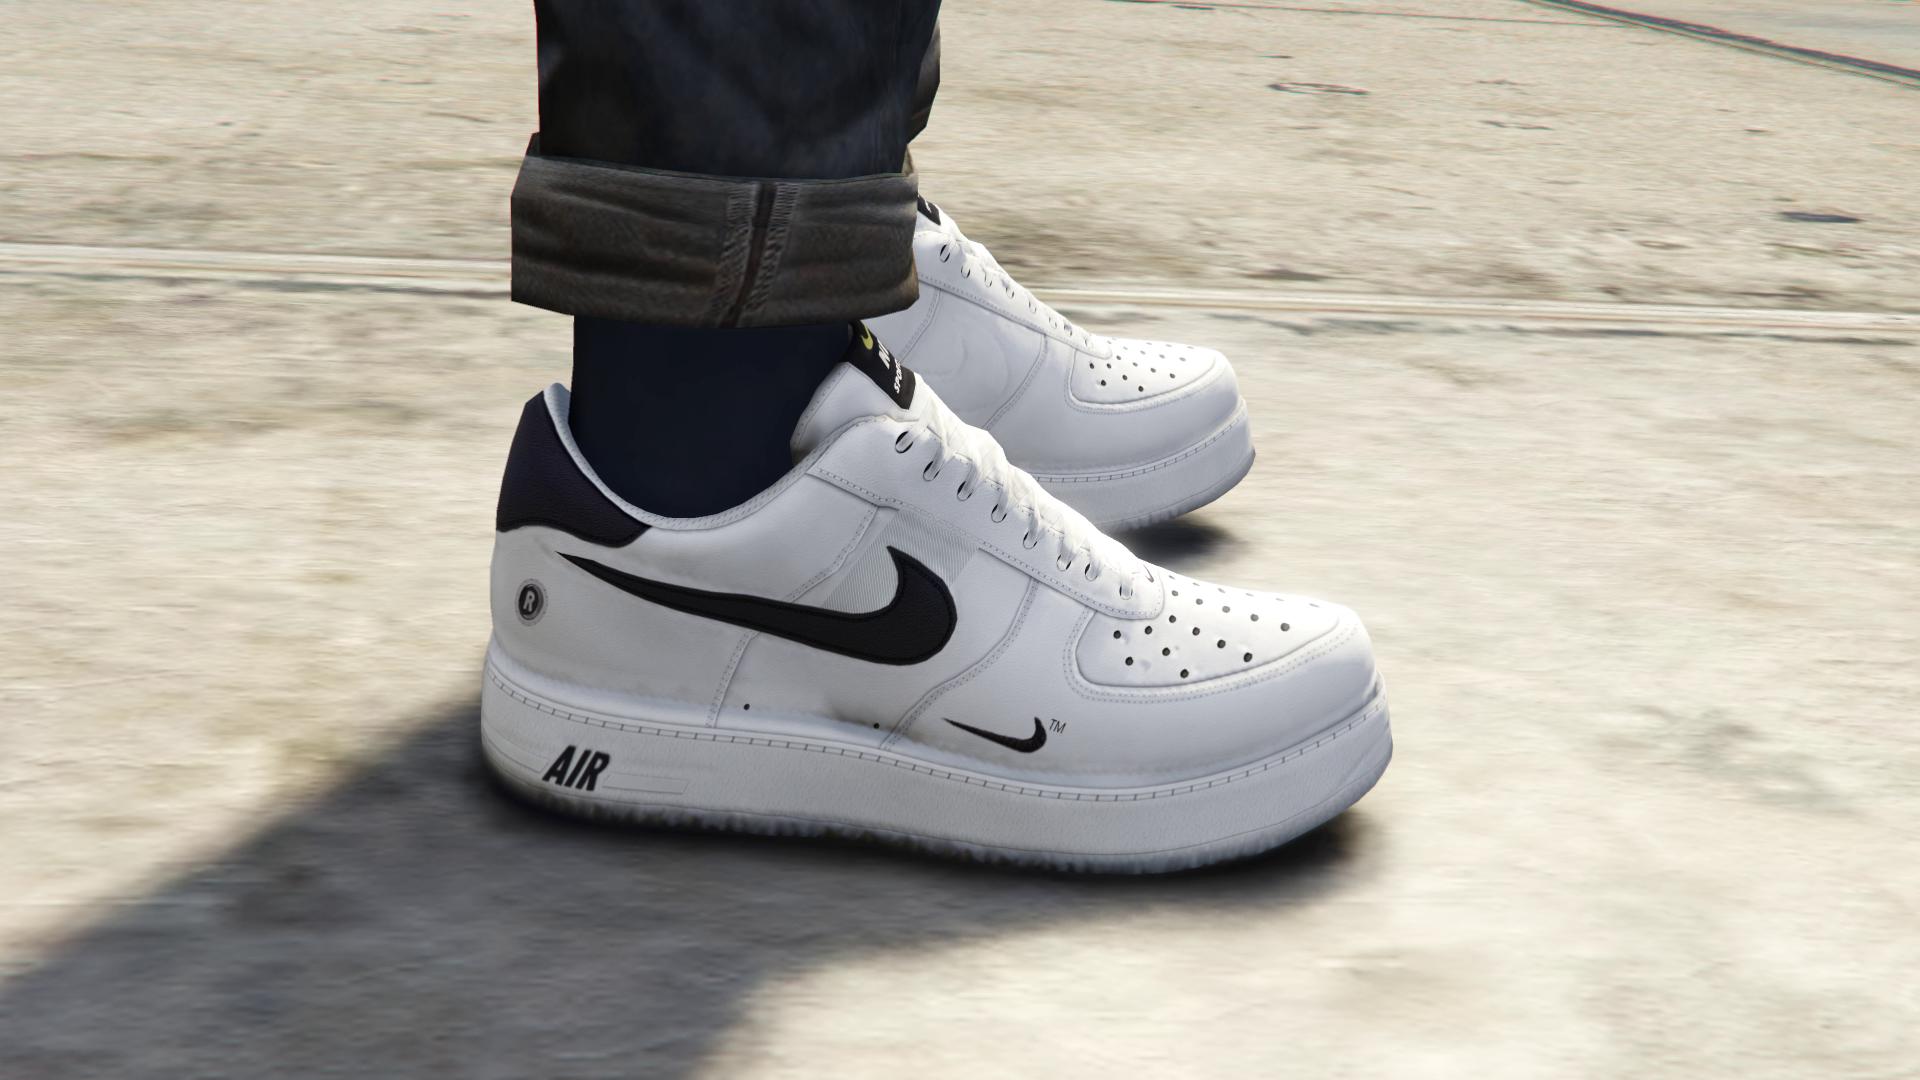 Nike Air Force 1 '07 LV8 Utility GTA5